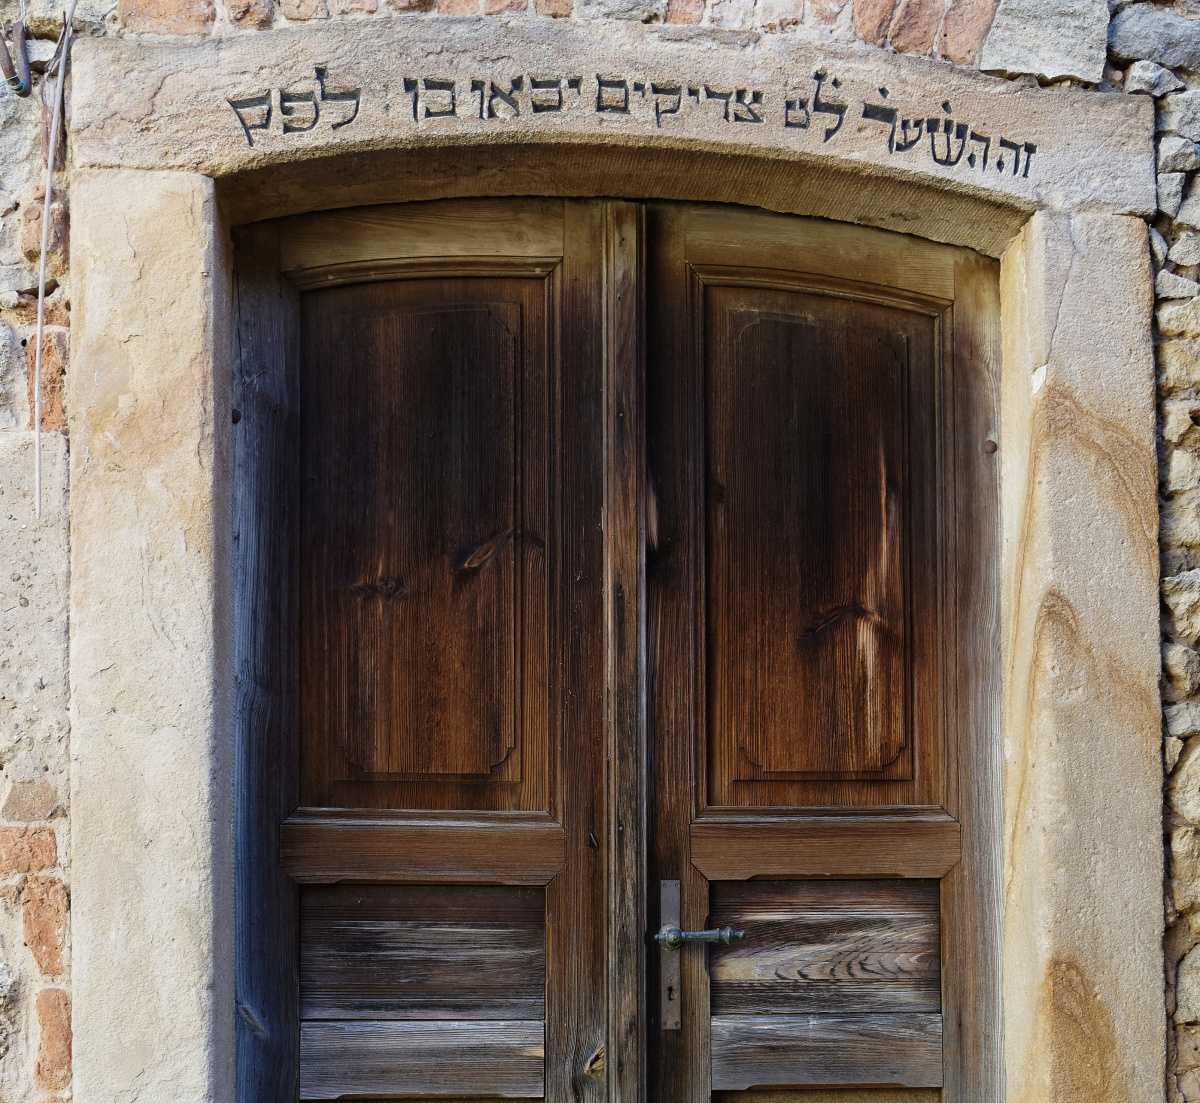 http://www.alemannia-judaica.de/images/Images%20423/Guntersblum%20Synagoge%203882a.jpg